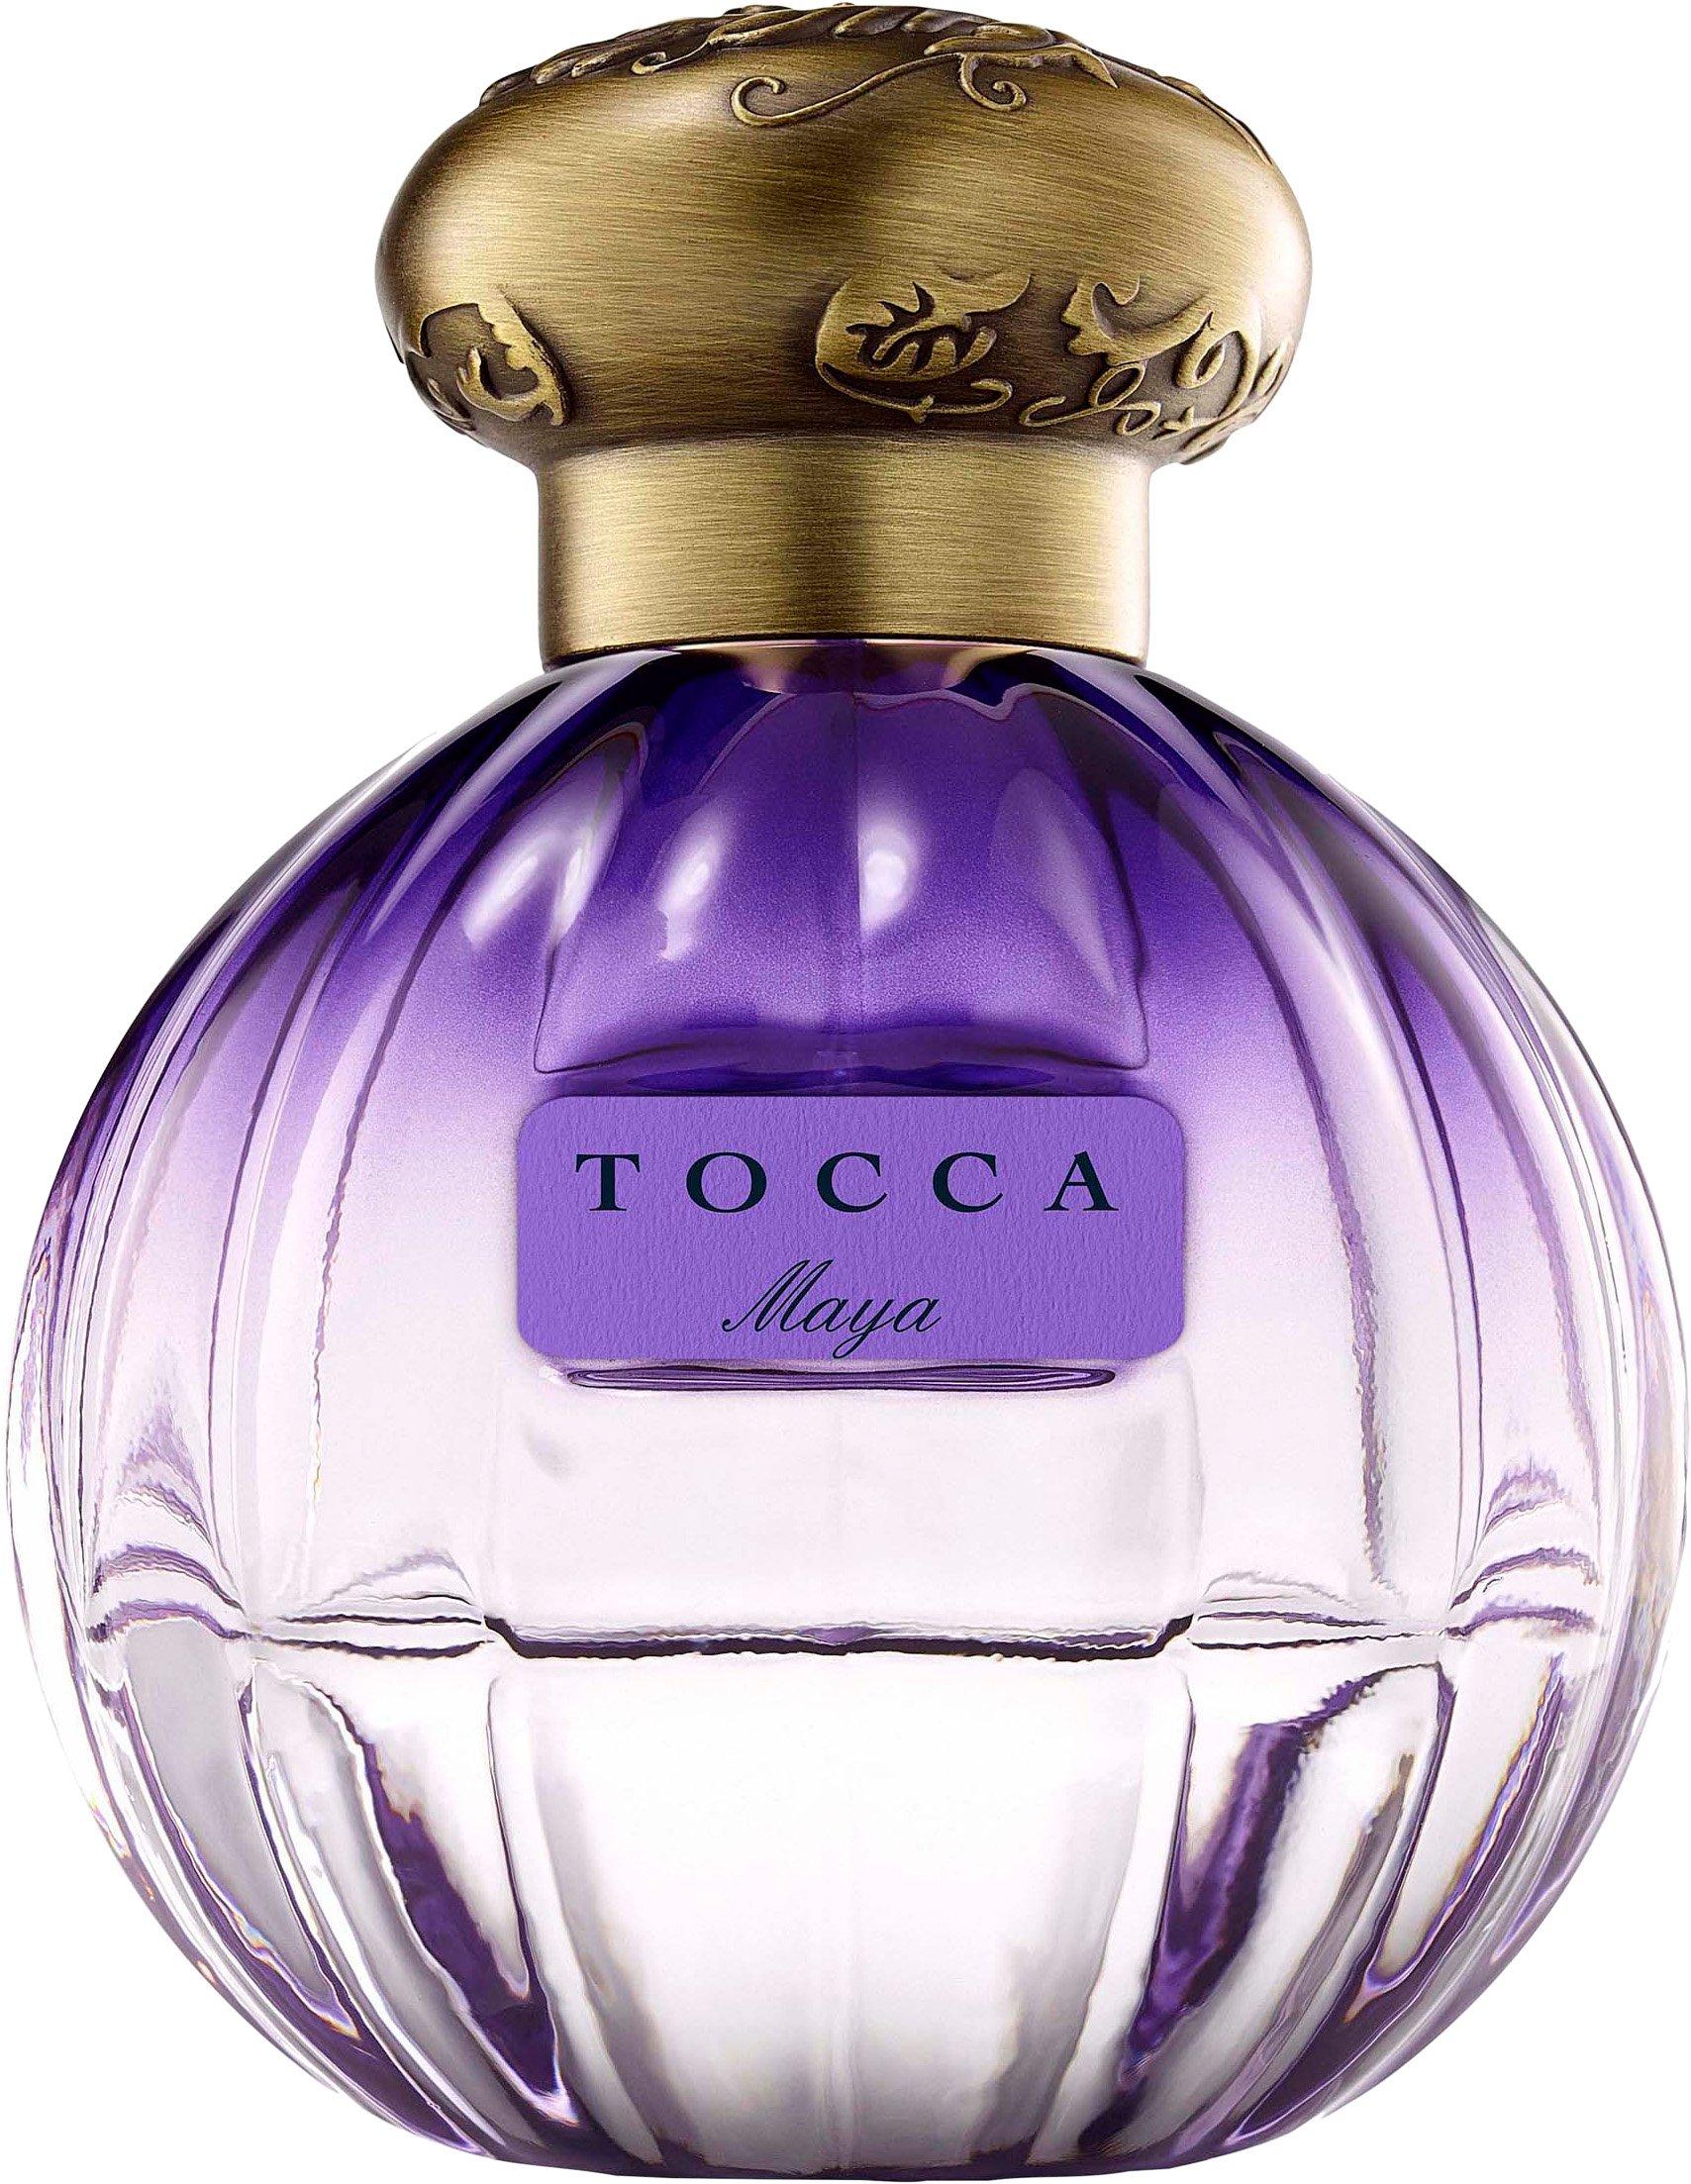 Tocca - Maya EDP 50 ml